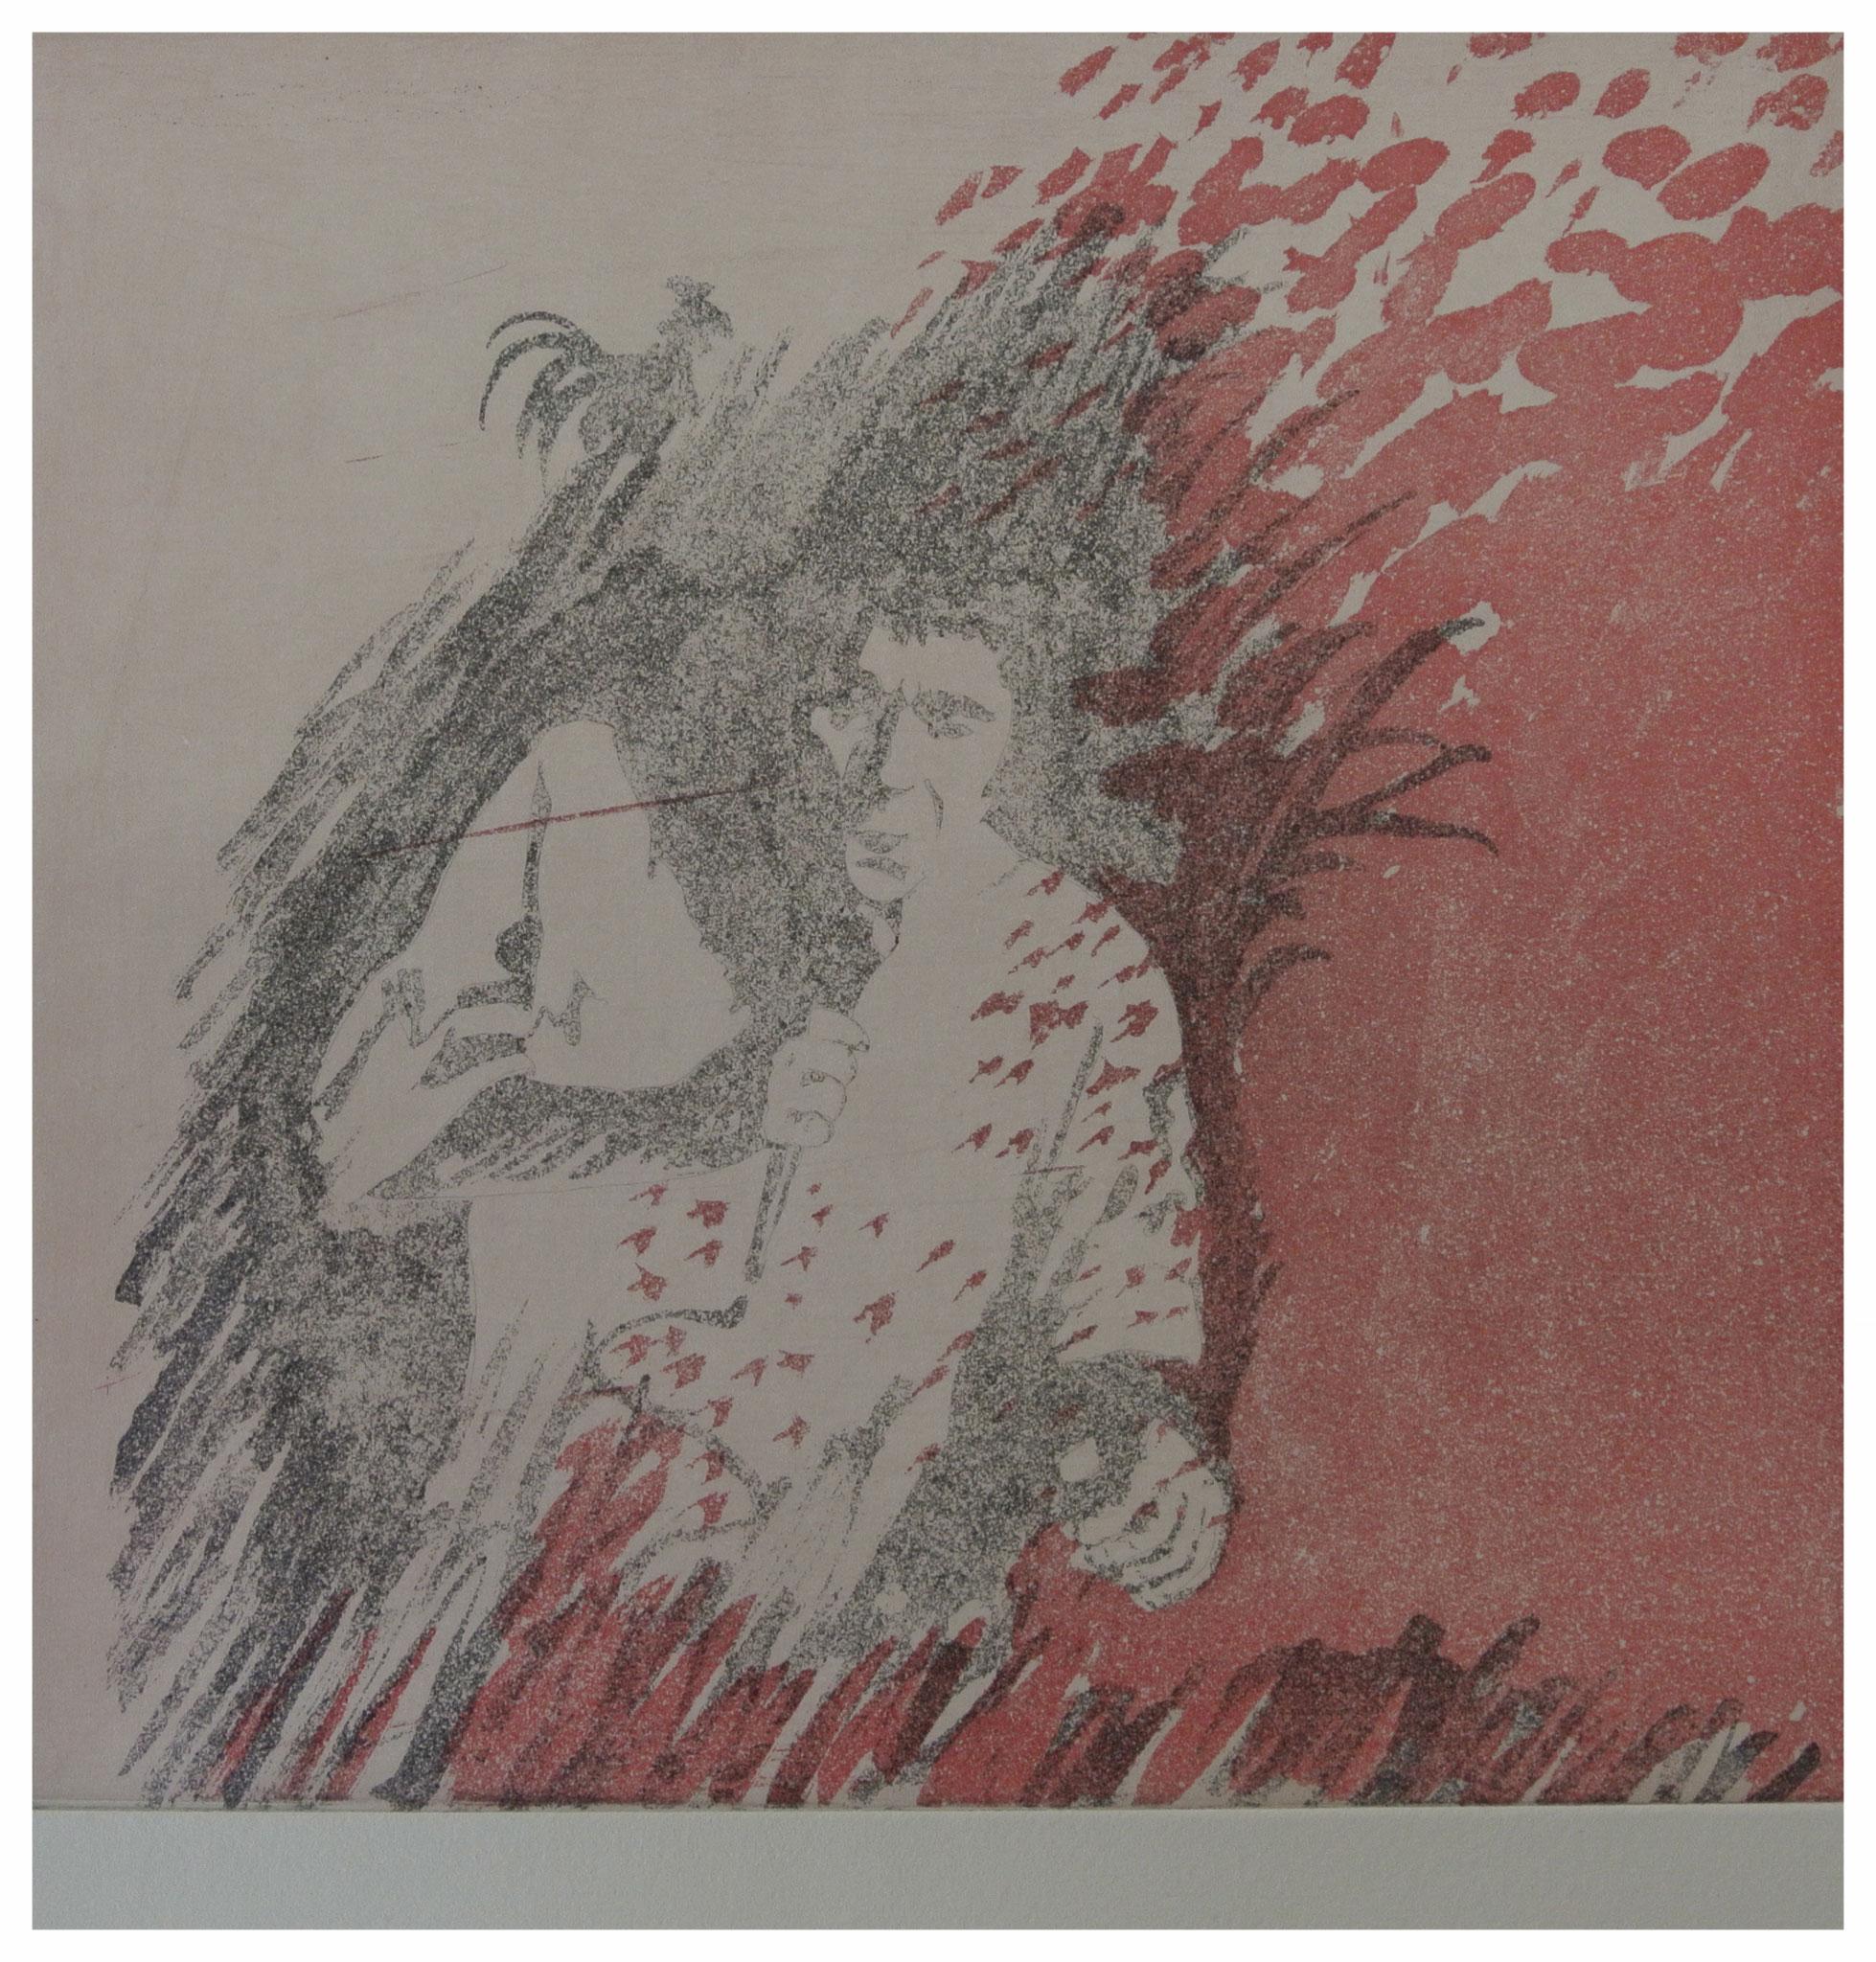 """Plume d' ange - Claude Nougaro "" Aquatinta mit Vernis mou"" / Druck Atelier H. Pfister Bern"